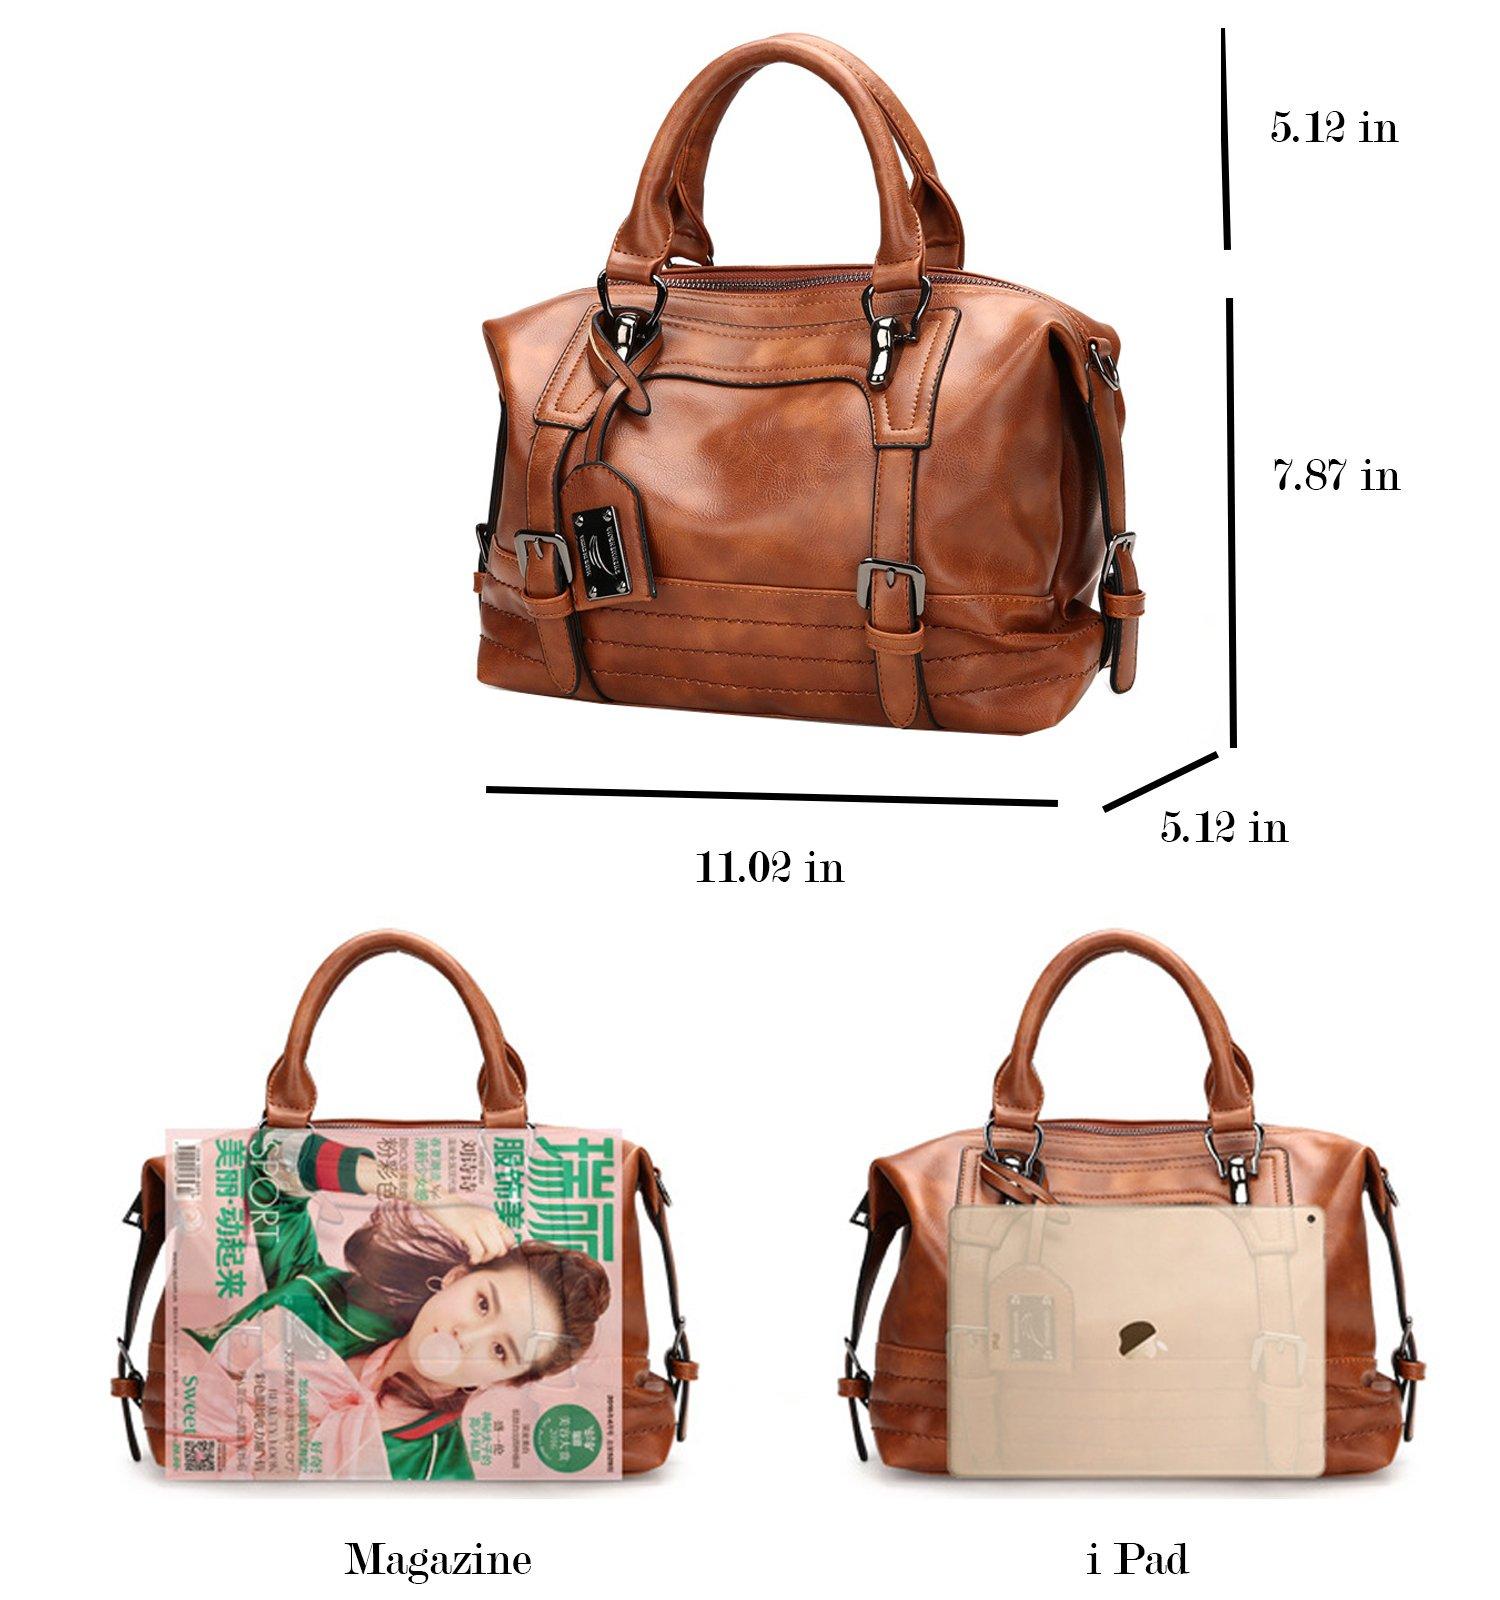 Juilletru Black Women Tote Bags PU Leather Handbags Top Handle Vintage Purse Crossbody Shoulder Bag by Juilletru (Image #6)